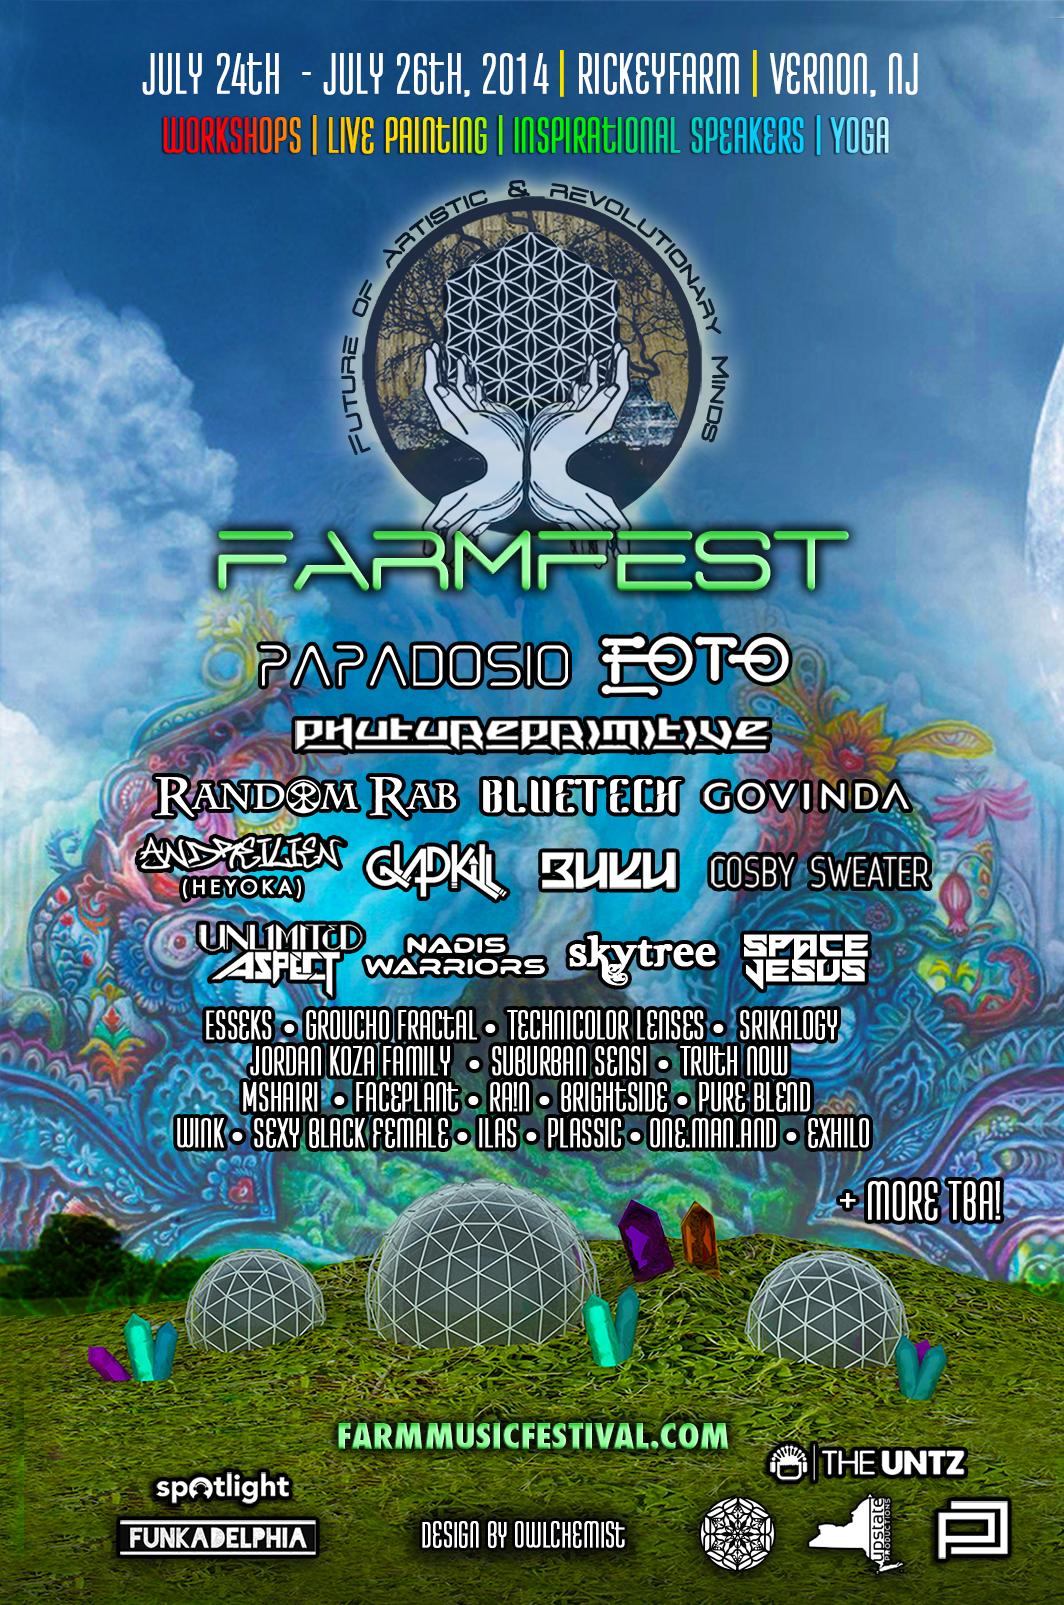 Farm Fest July 24th-26th Vernon, NJ Preview